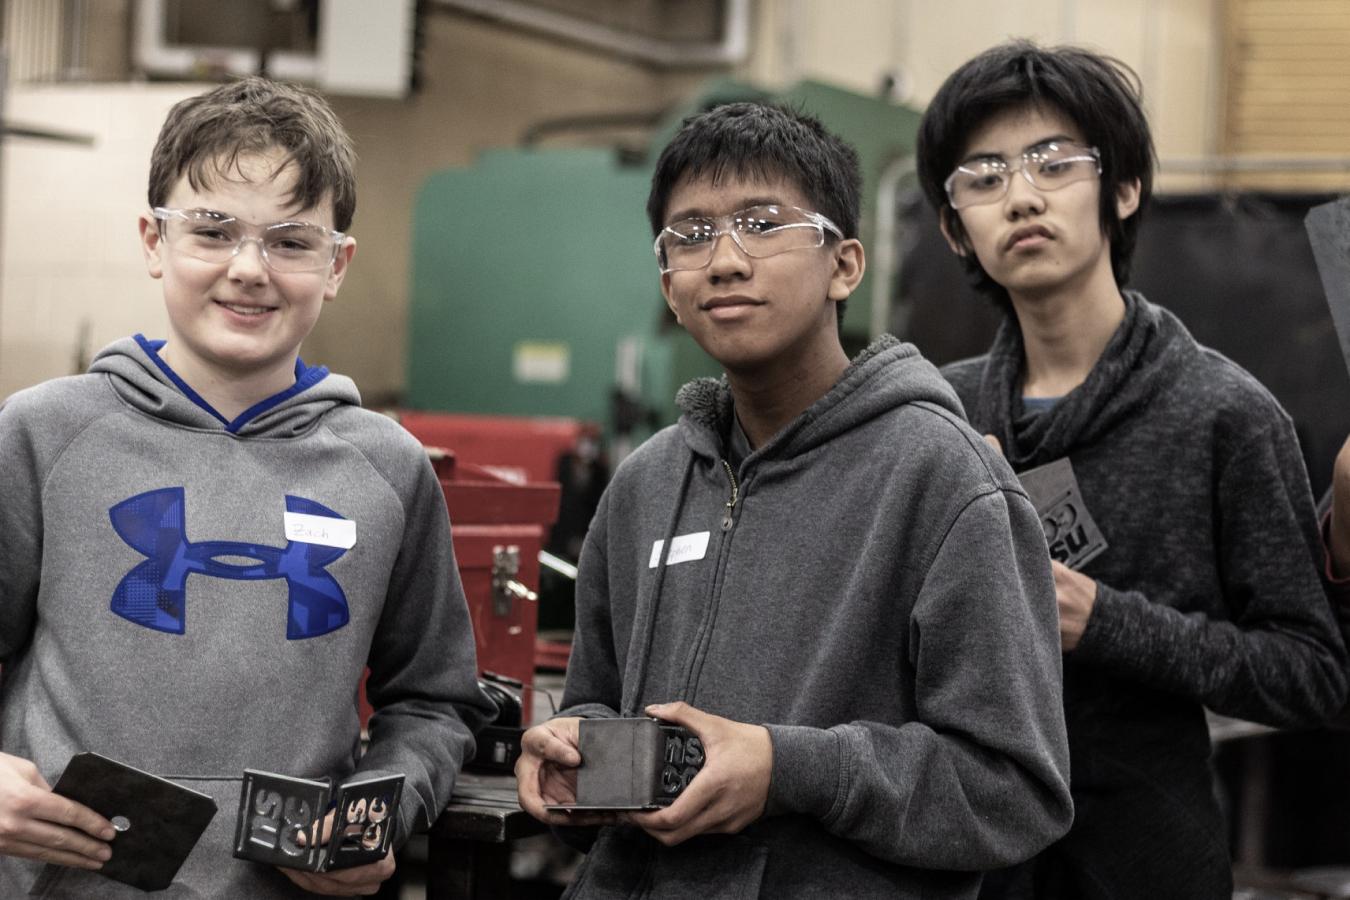 Three Boys from the I Am Potential Program